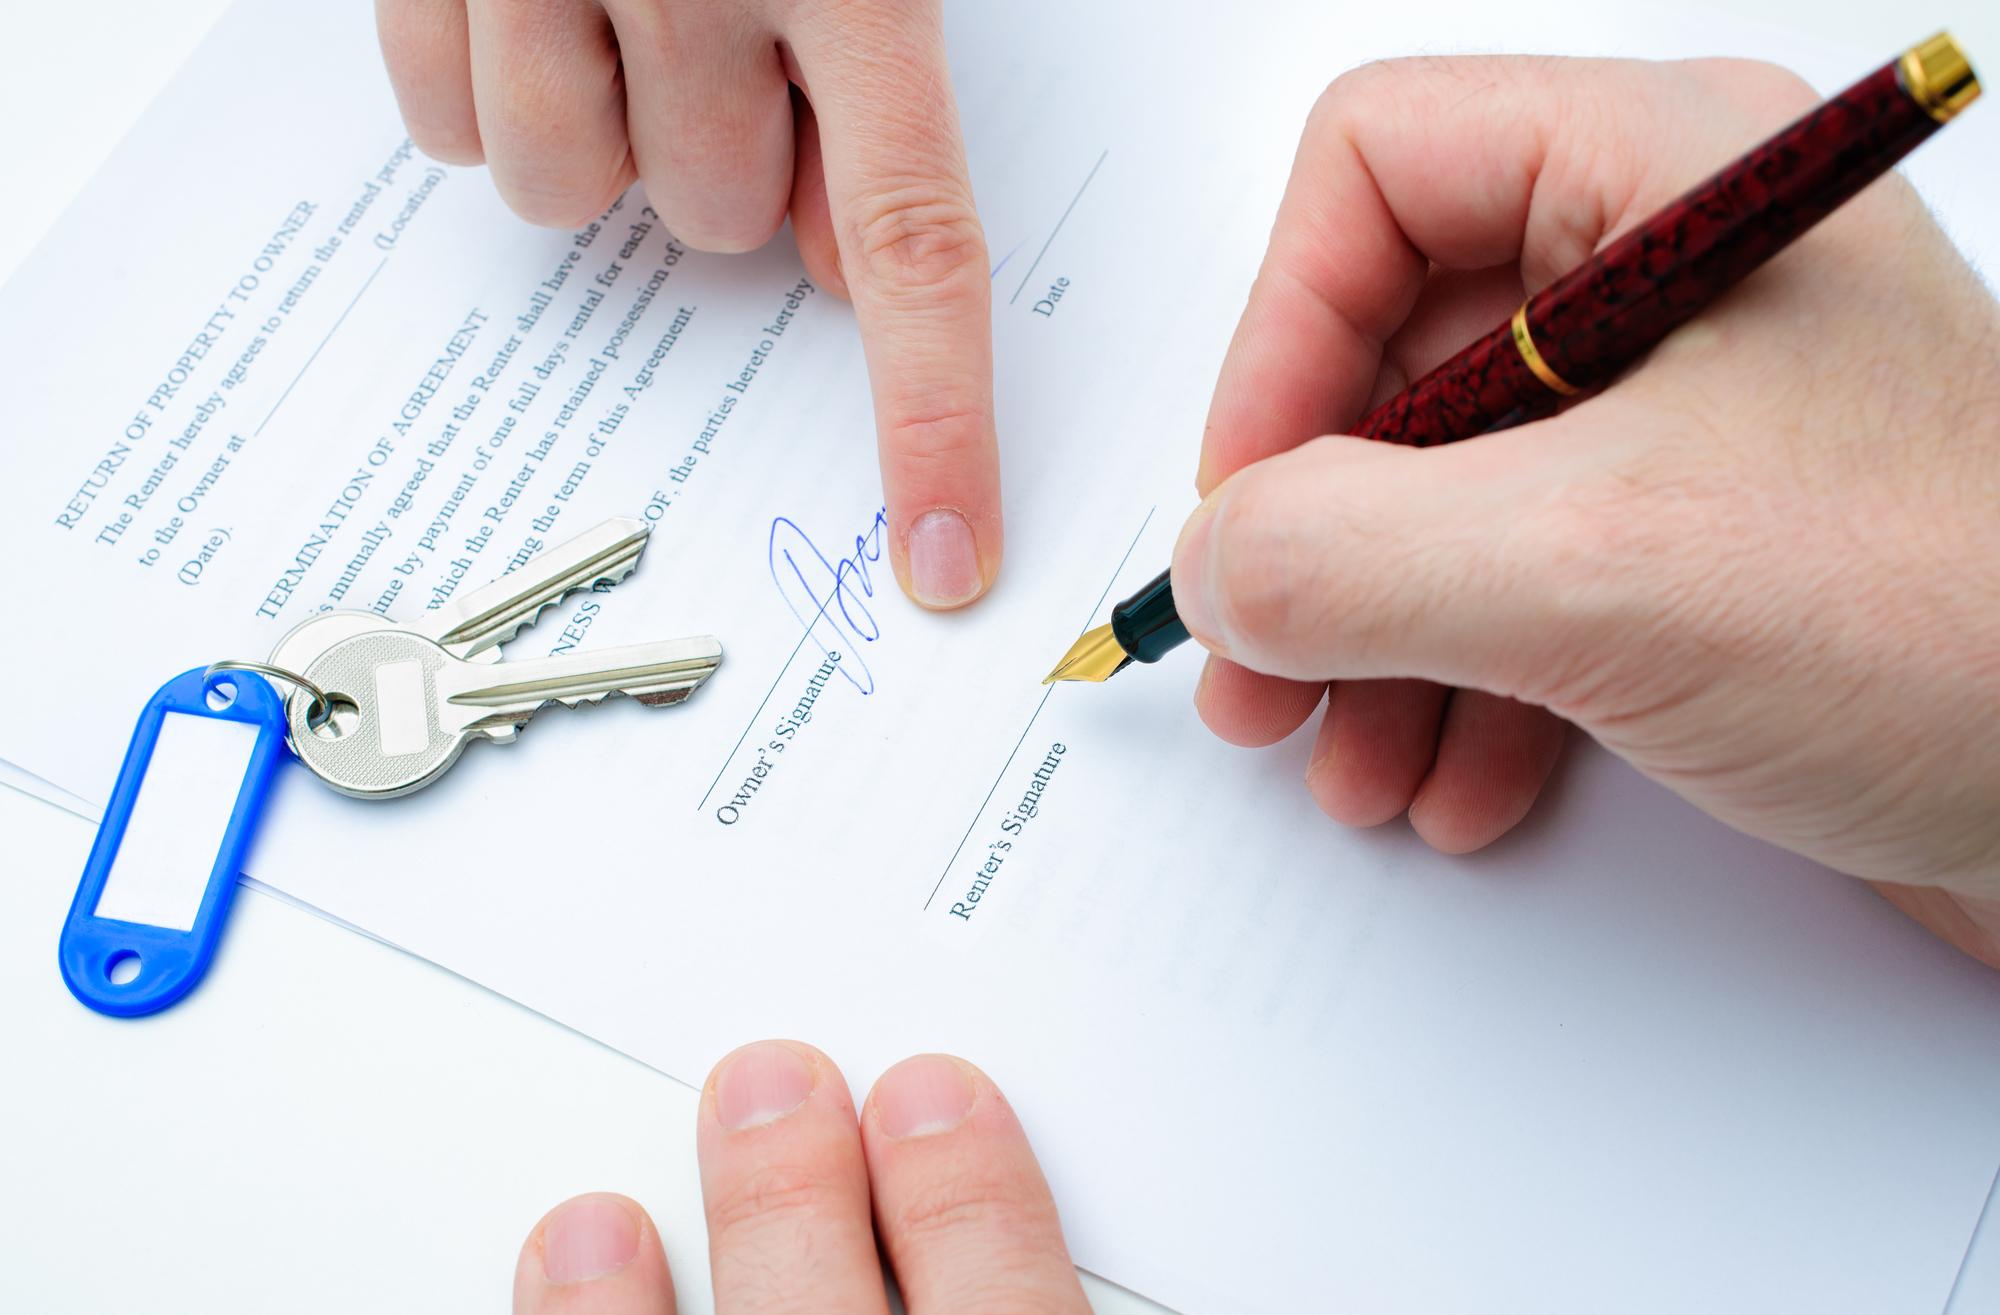 Contrato de arrendamiento o alquiler